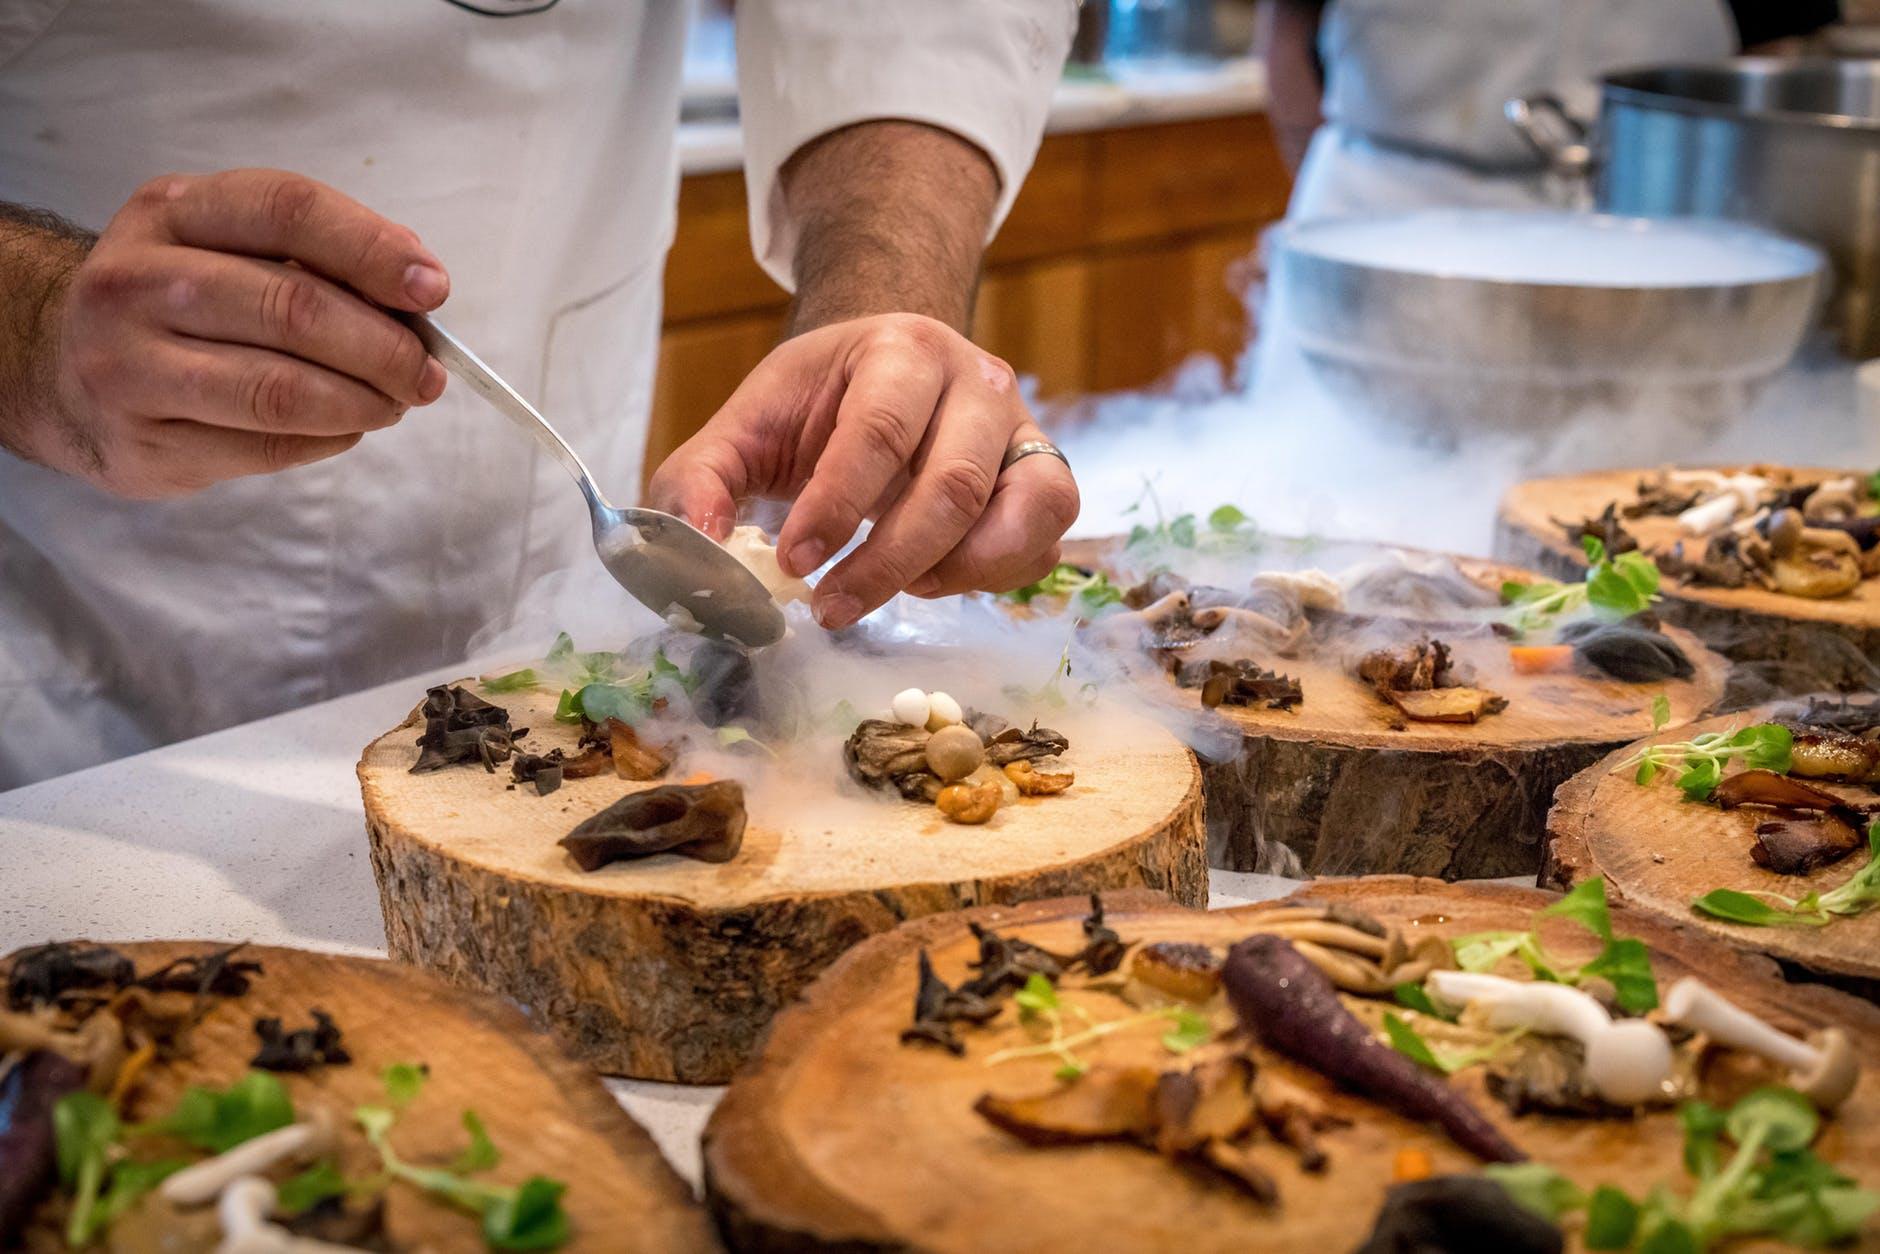 Restaurant Marketing Ideas for Instagram